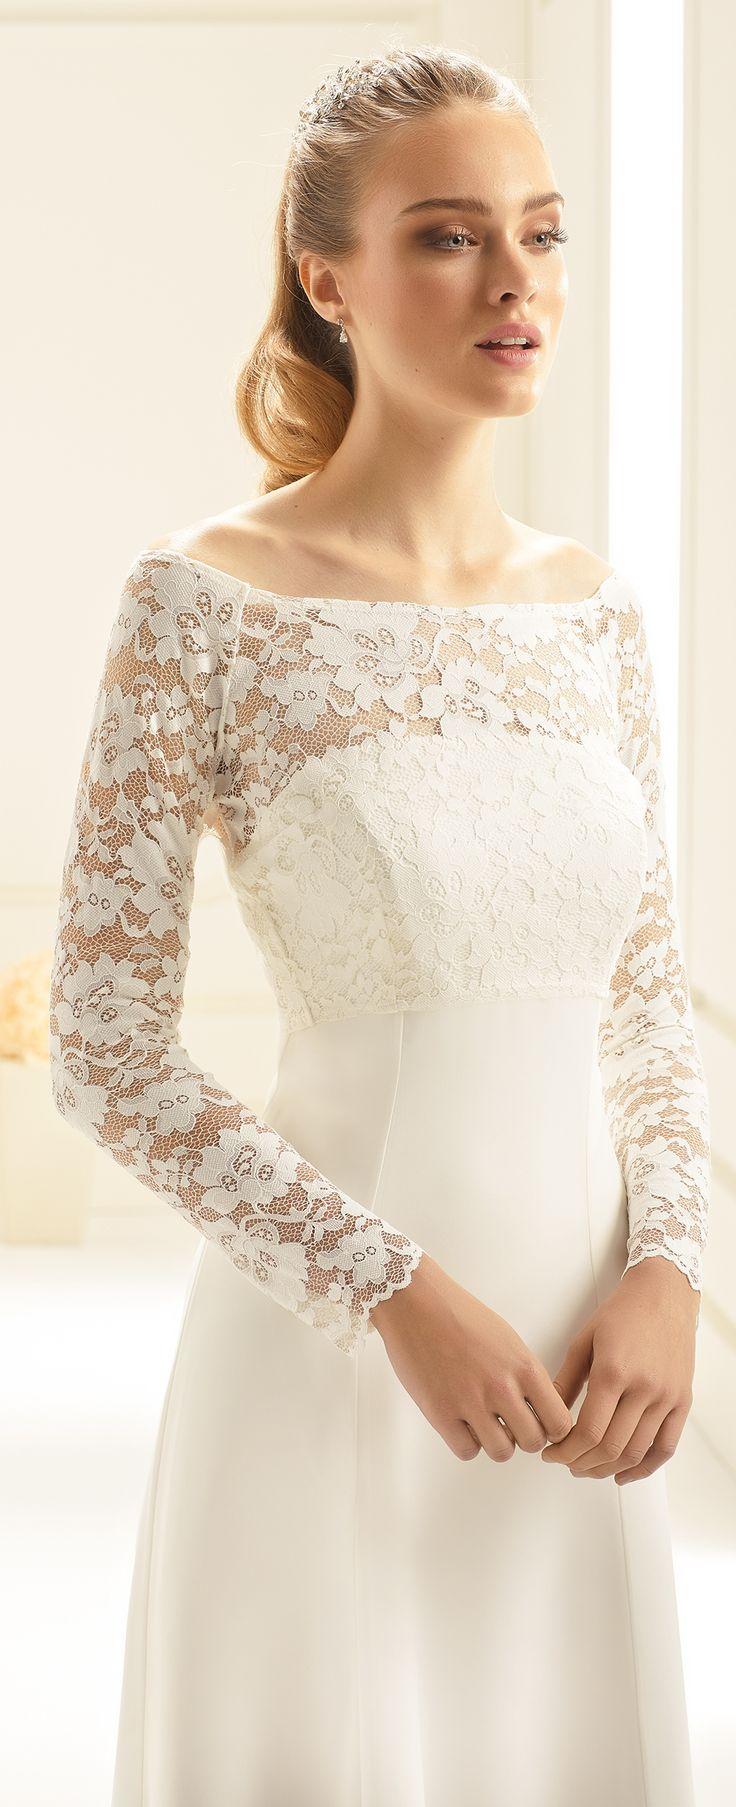 Our bolero E251 as perfect detail to compliete vintage wedding look! #biancoevento #biancobride #boleros #wedding #weddingideas #vintagewedding #bridalaccessories #bridalfashion